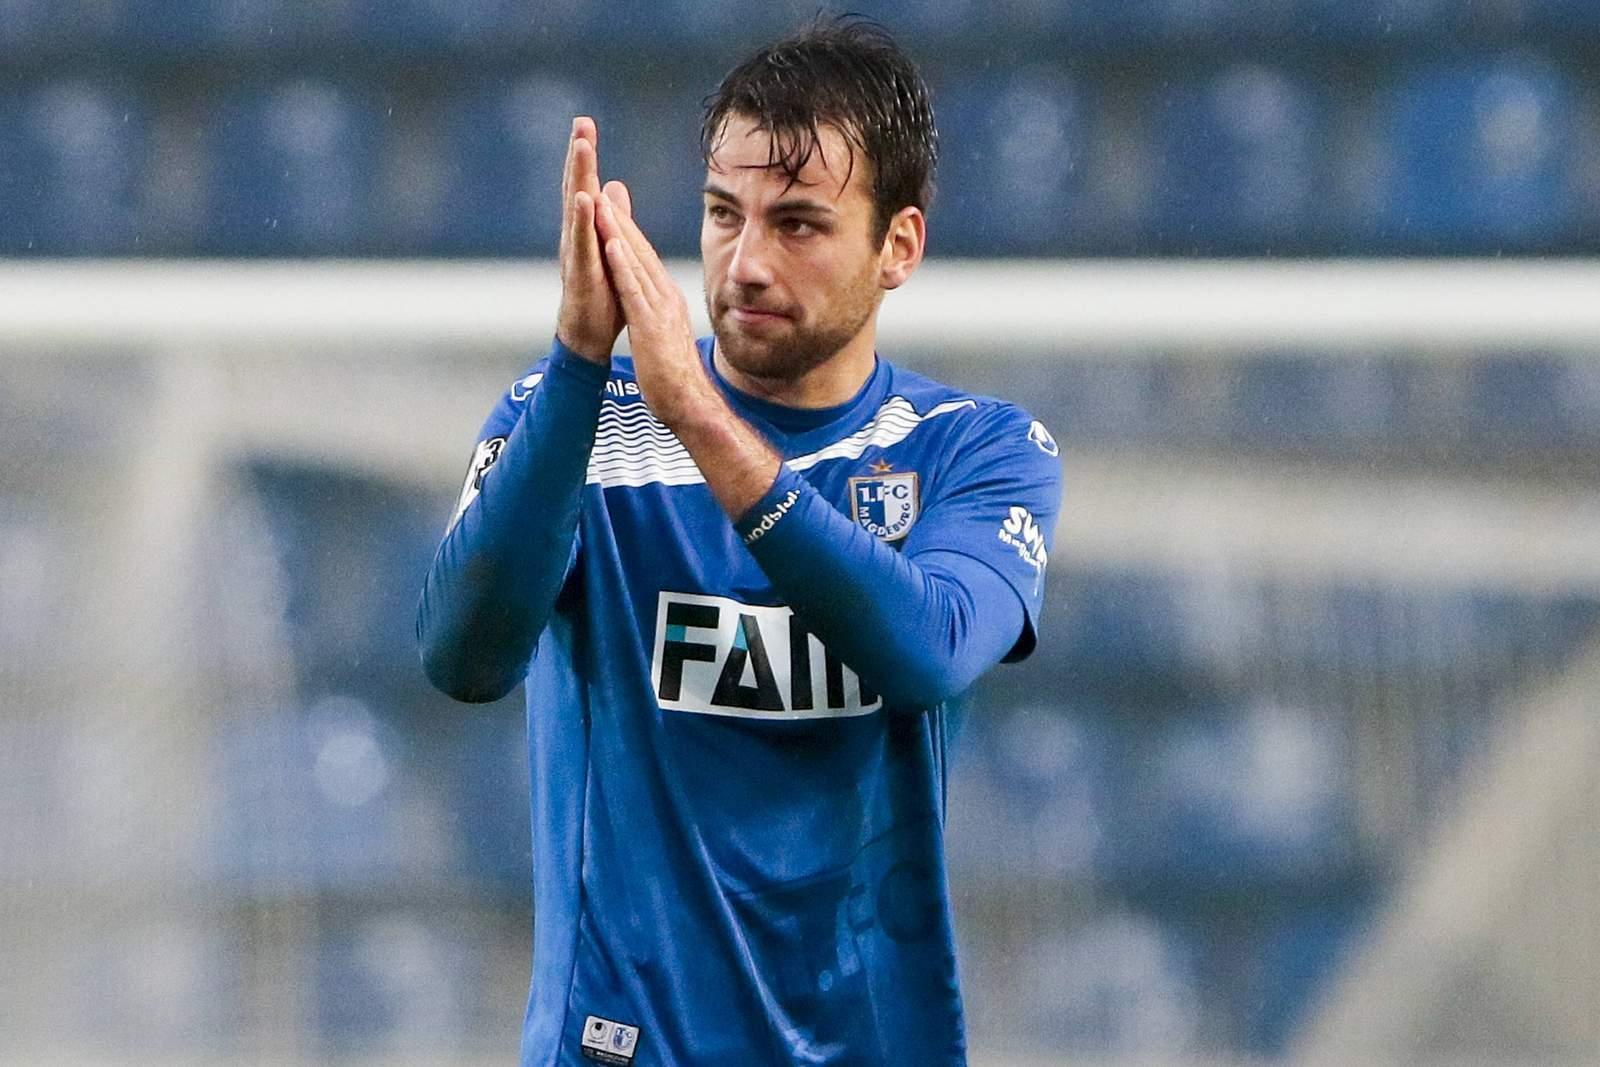 Christian Beck vom 1. FC Magdeburg